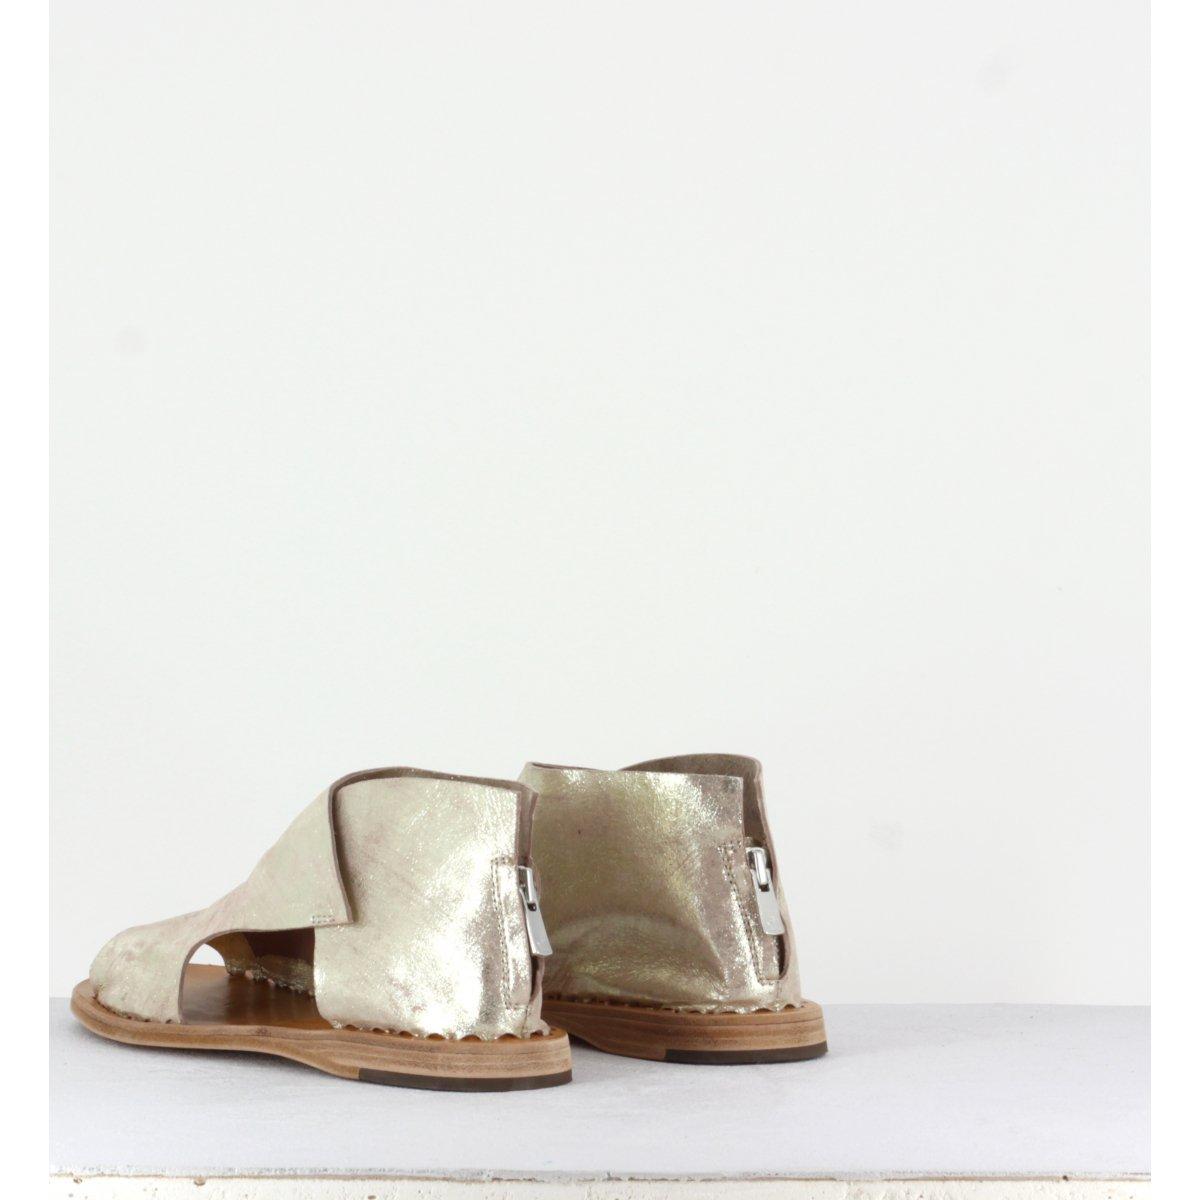 Sandales plates dorées - Itaca 018 Platino